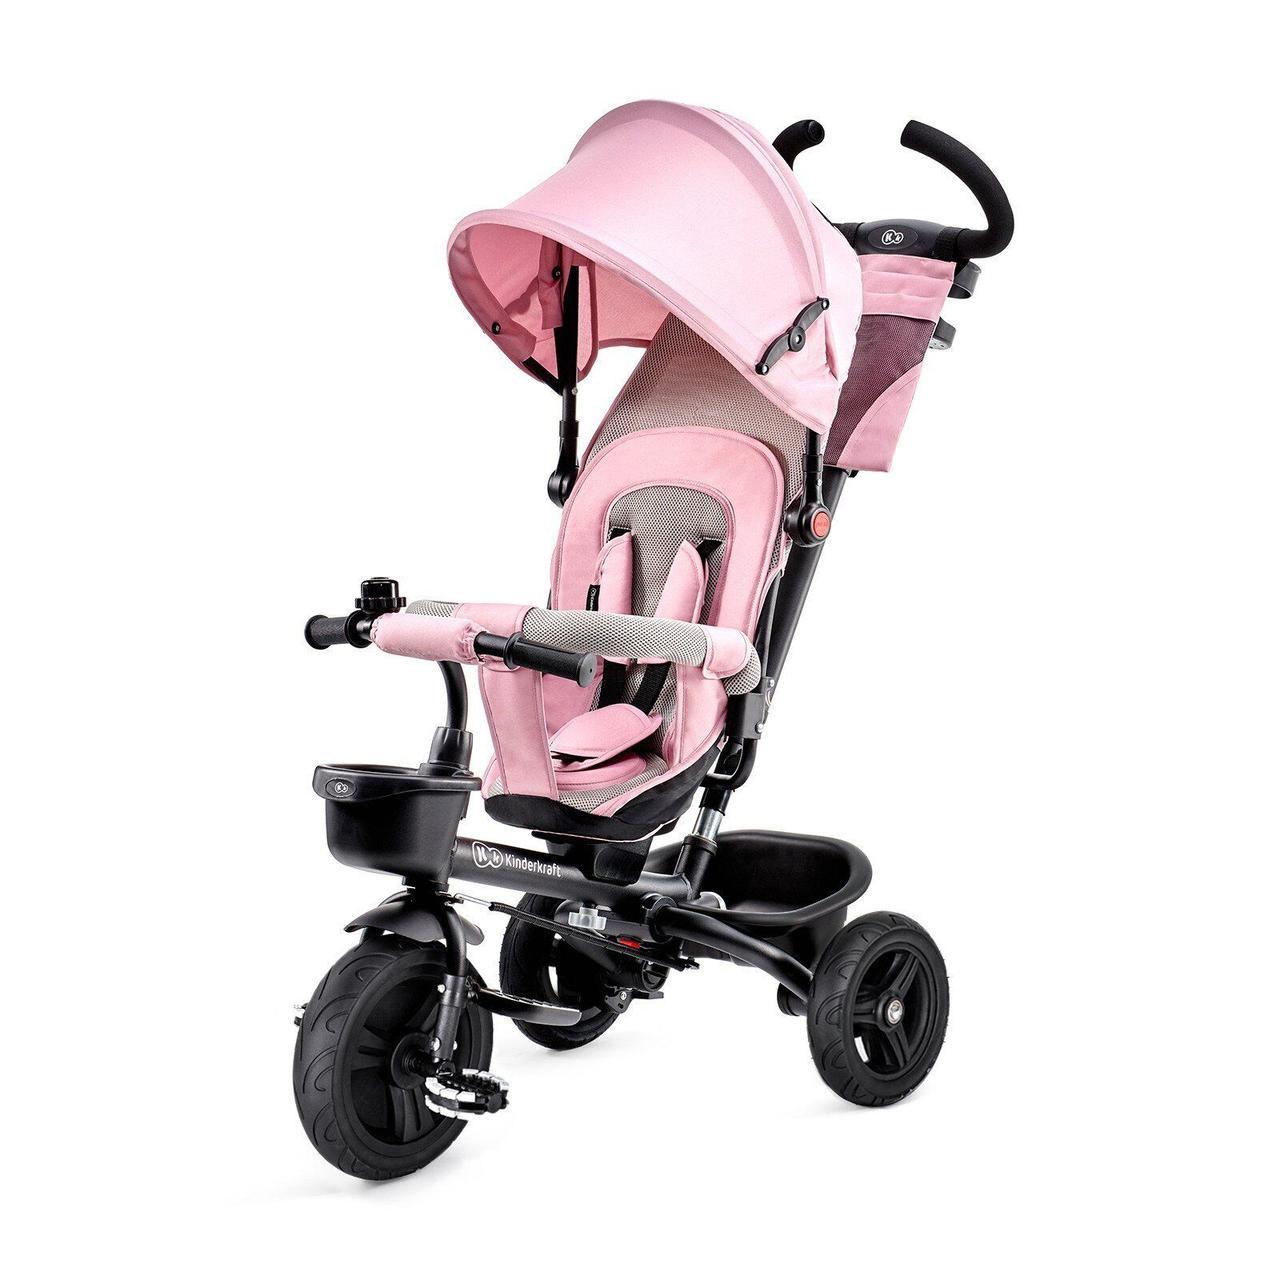 Трехколесный велосипед Aveo Pink Kinderkraft 5902533908899